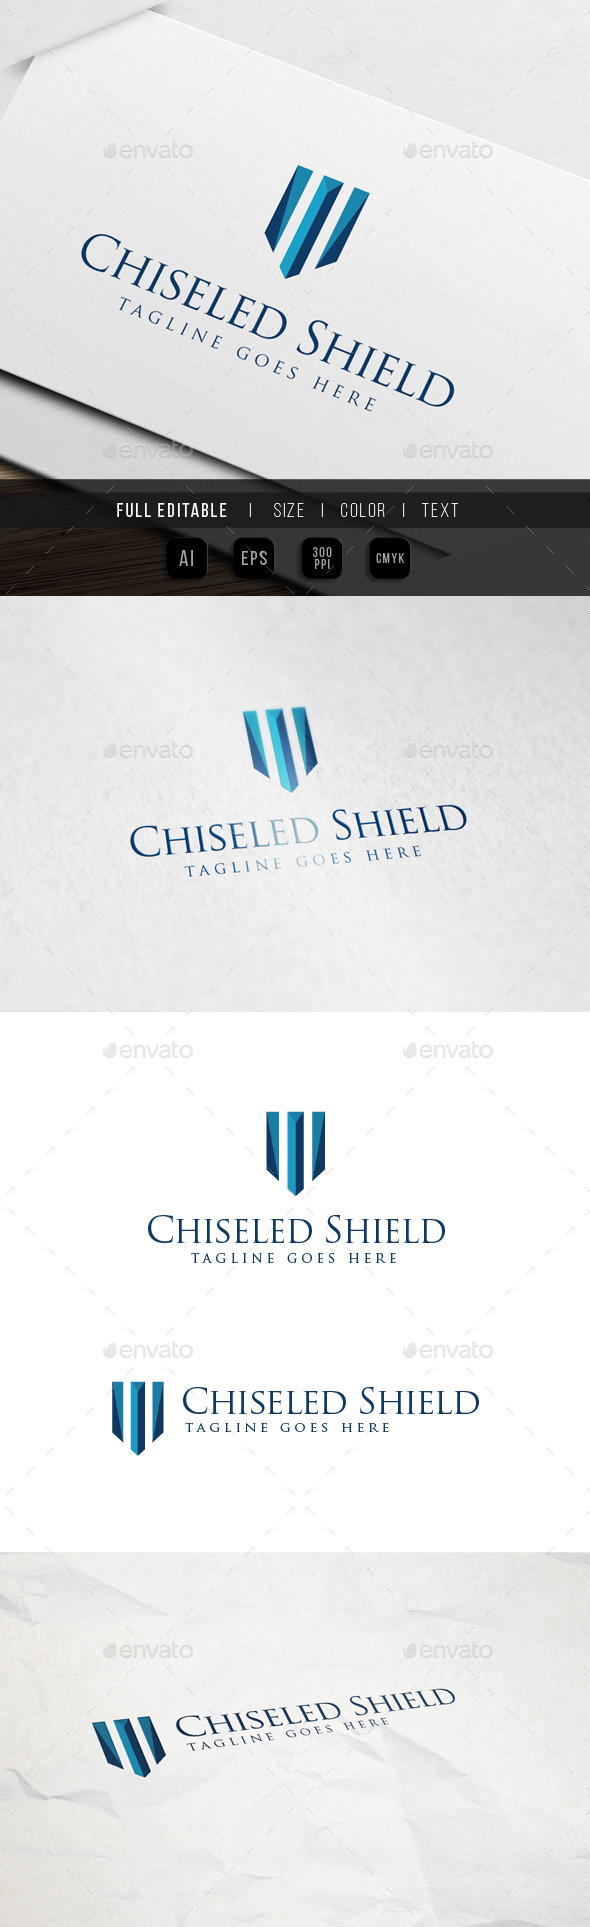 Gem Chiseled Shield Logo - Abstract Logo Templates